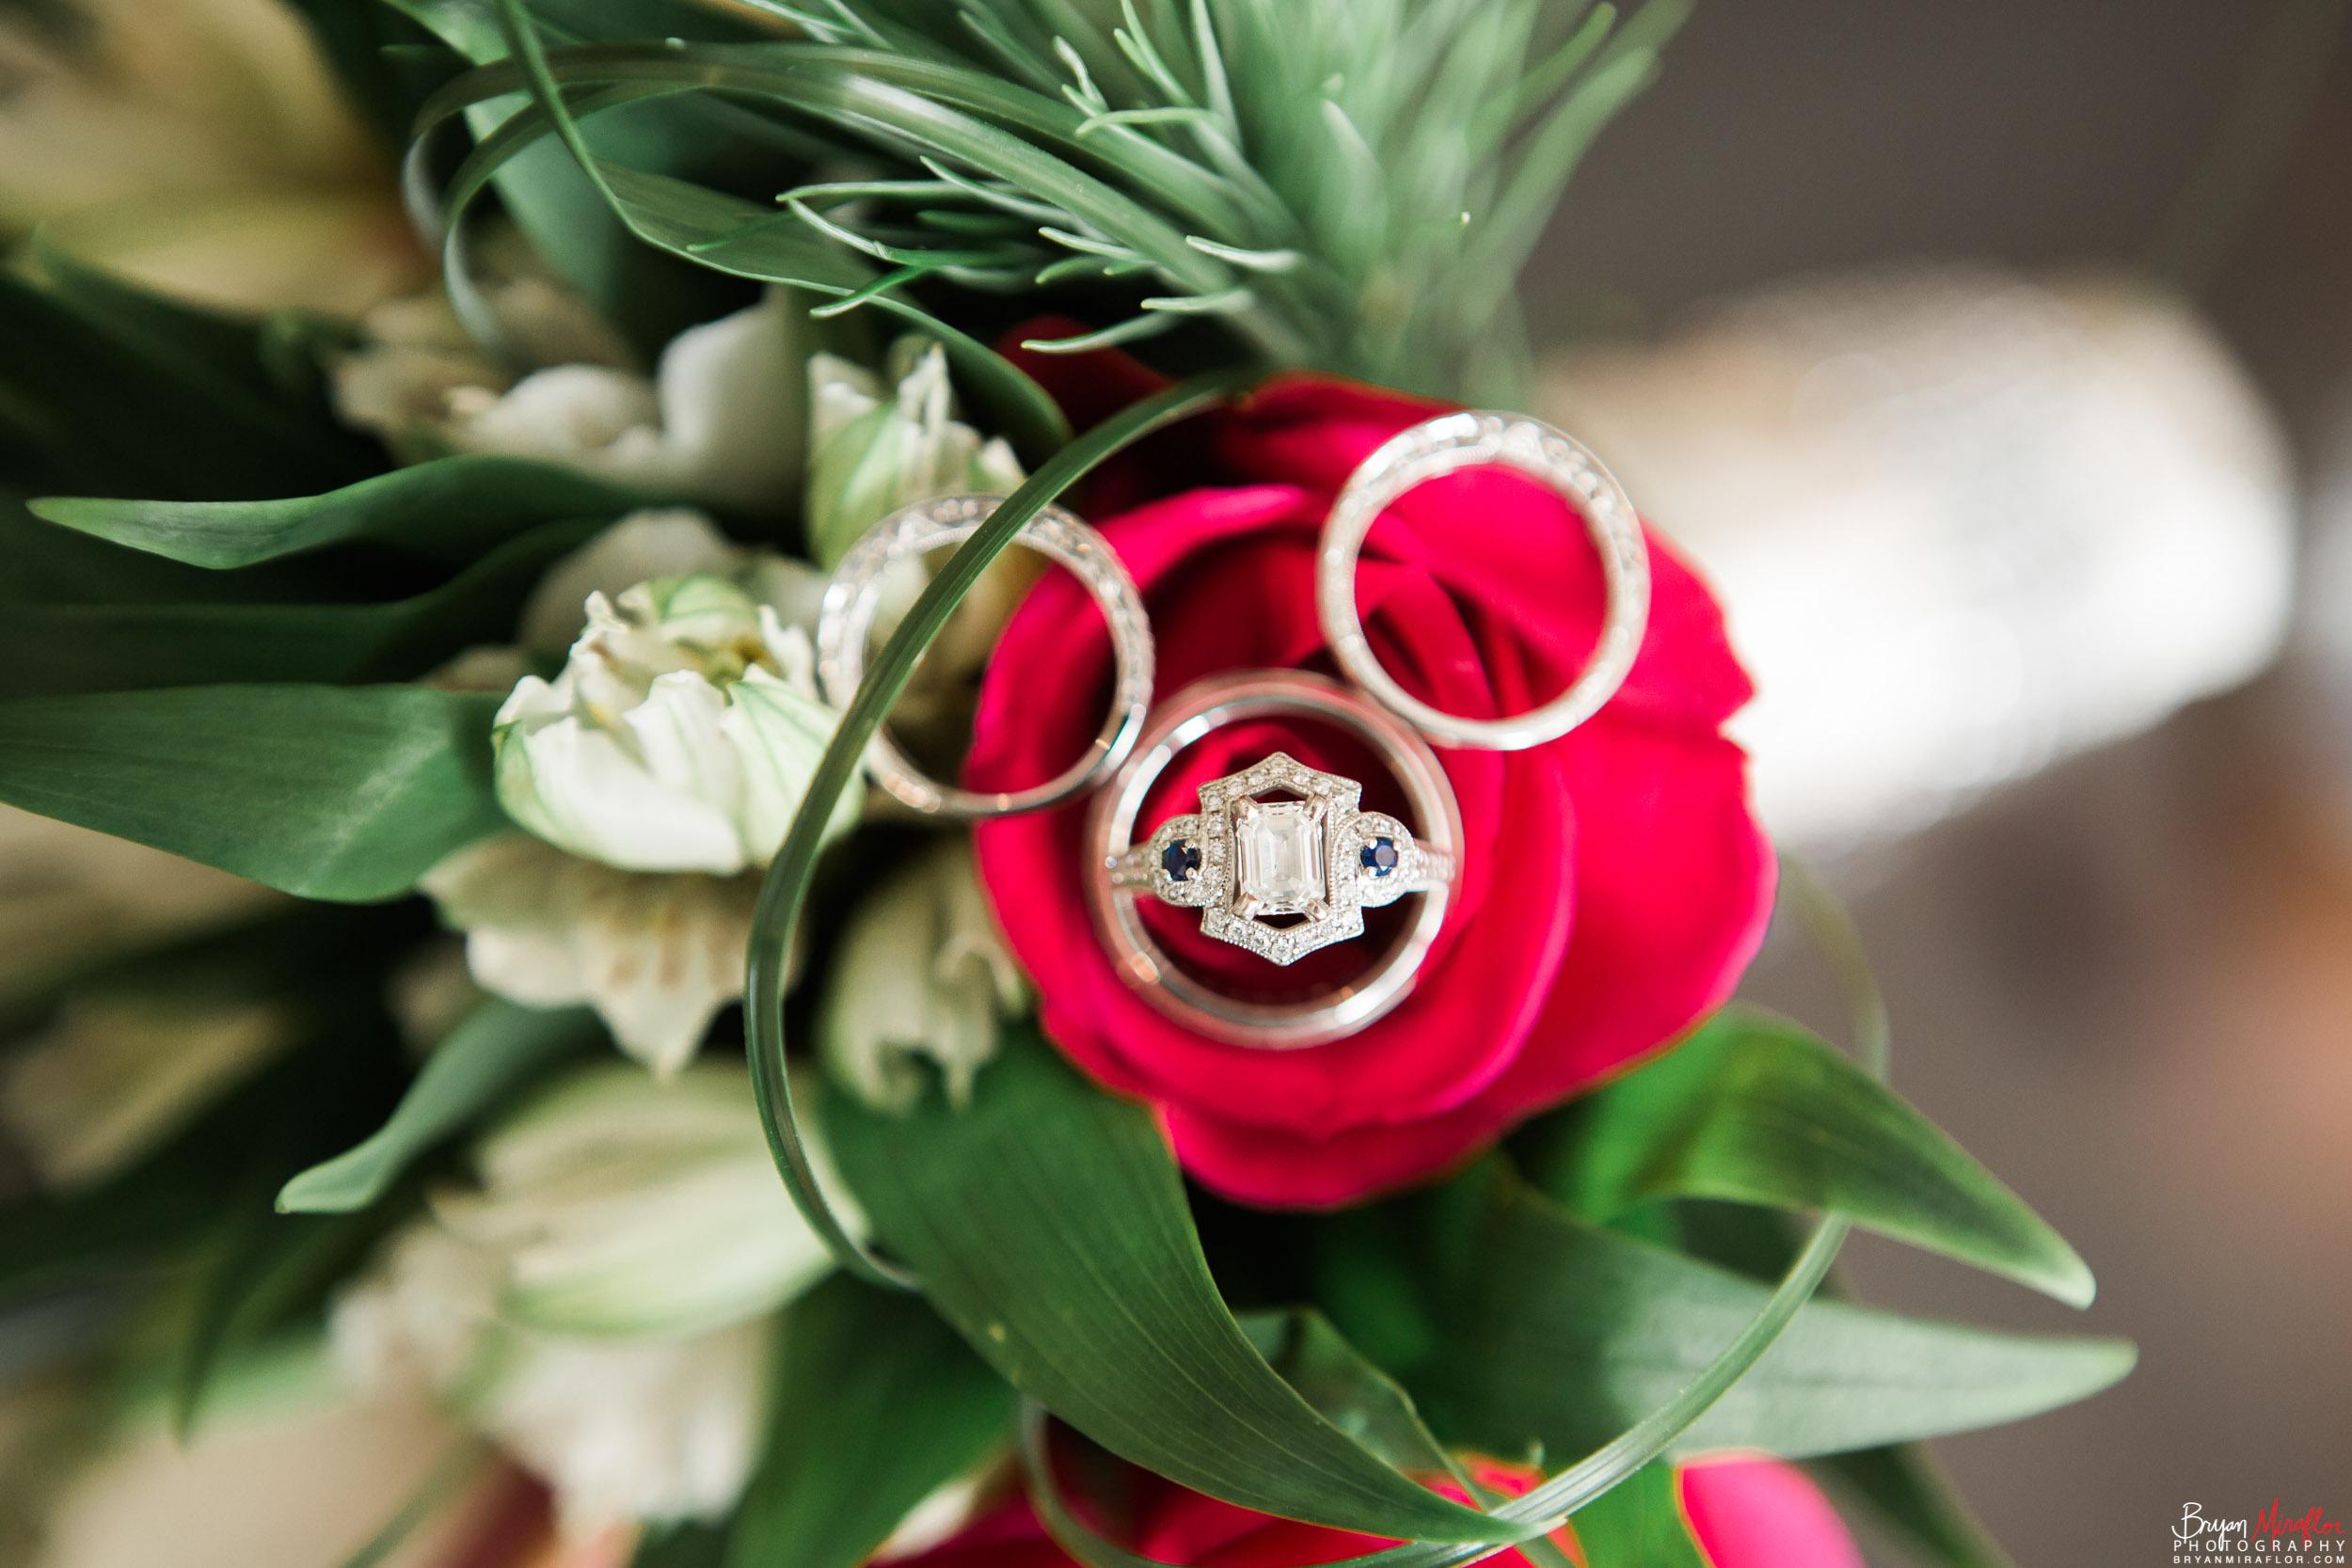 Bryan-Miraflor-Photography-Hannah-Jonathan-Married-Grand-Traditions-Estate-Gardens-Fallbrook-20171222-012.jpg